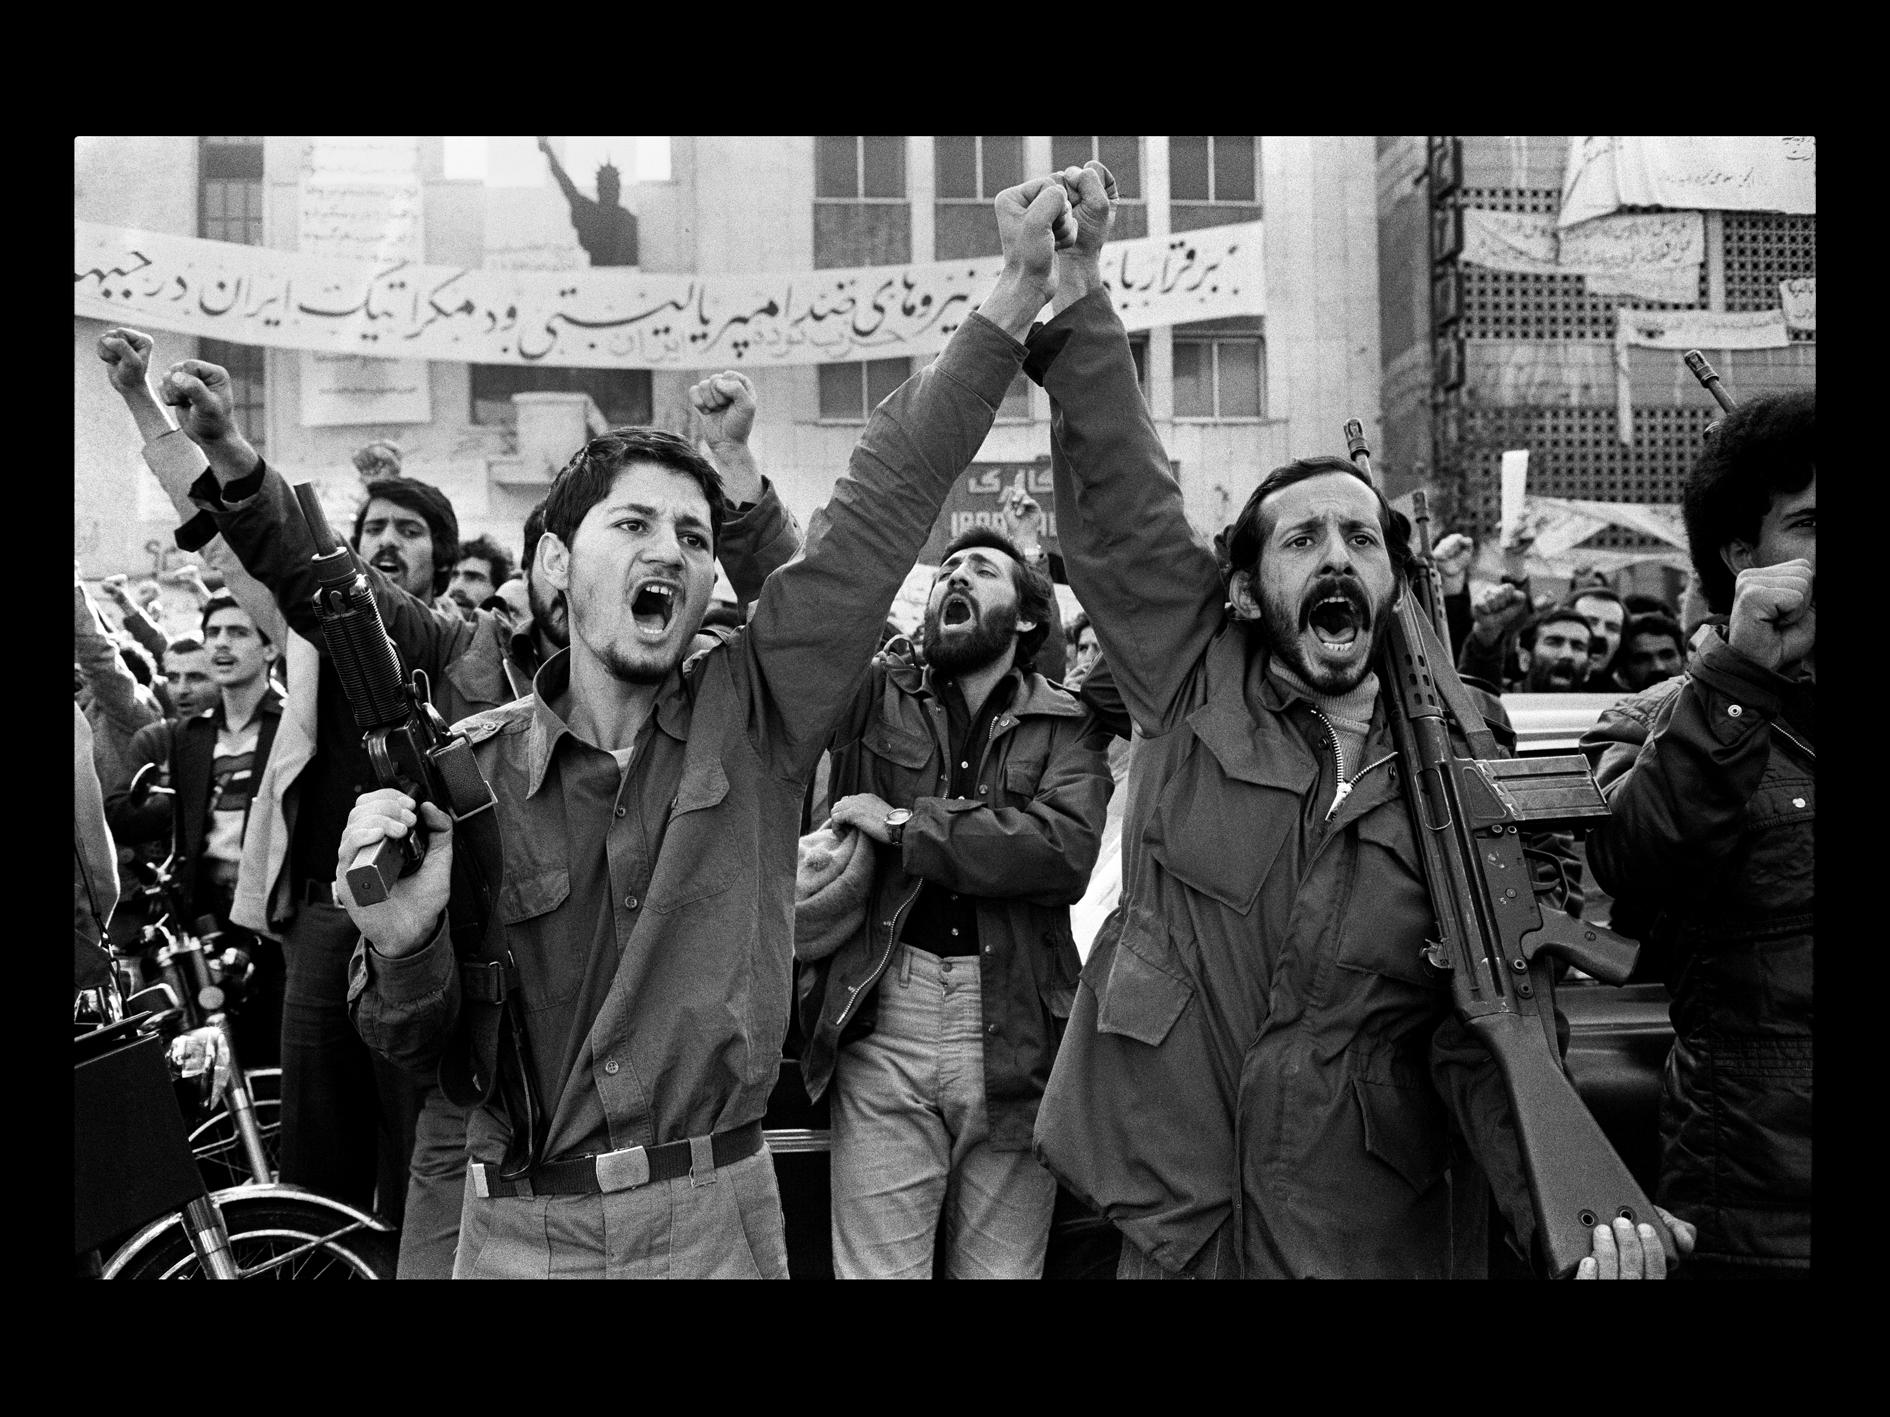 Revolution vs revolution beirut art center inferno 2 steven cohen chandelier 2001 3 abbas iran revolution 1978 9 4 susan meiselas reframing history nicaragua juillet 2004 aloadofball Choice Image